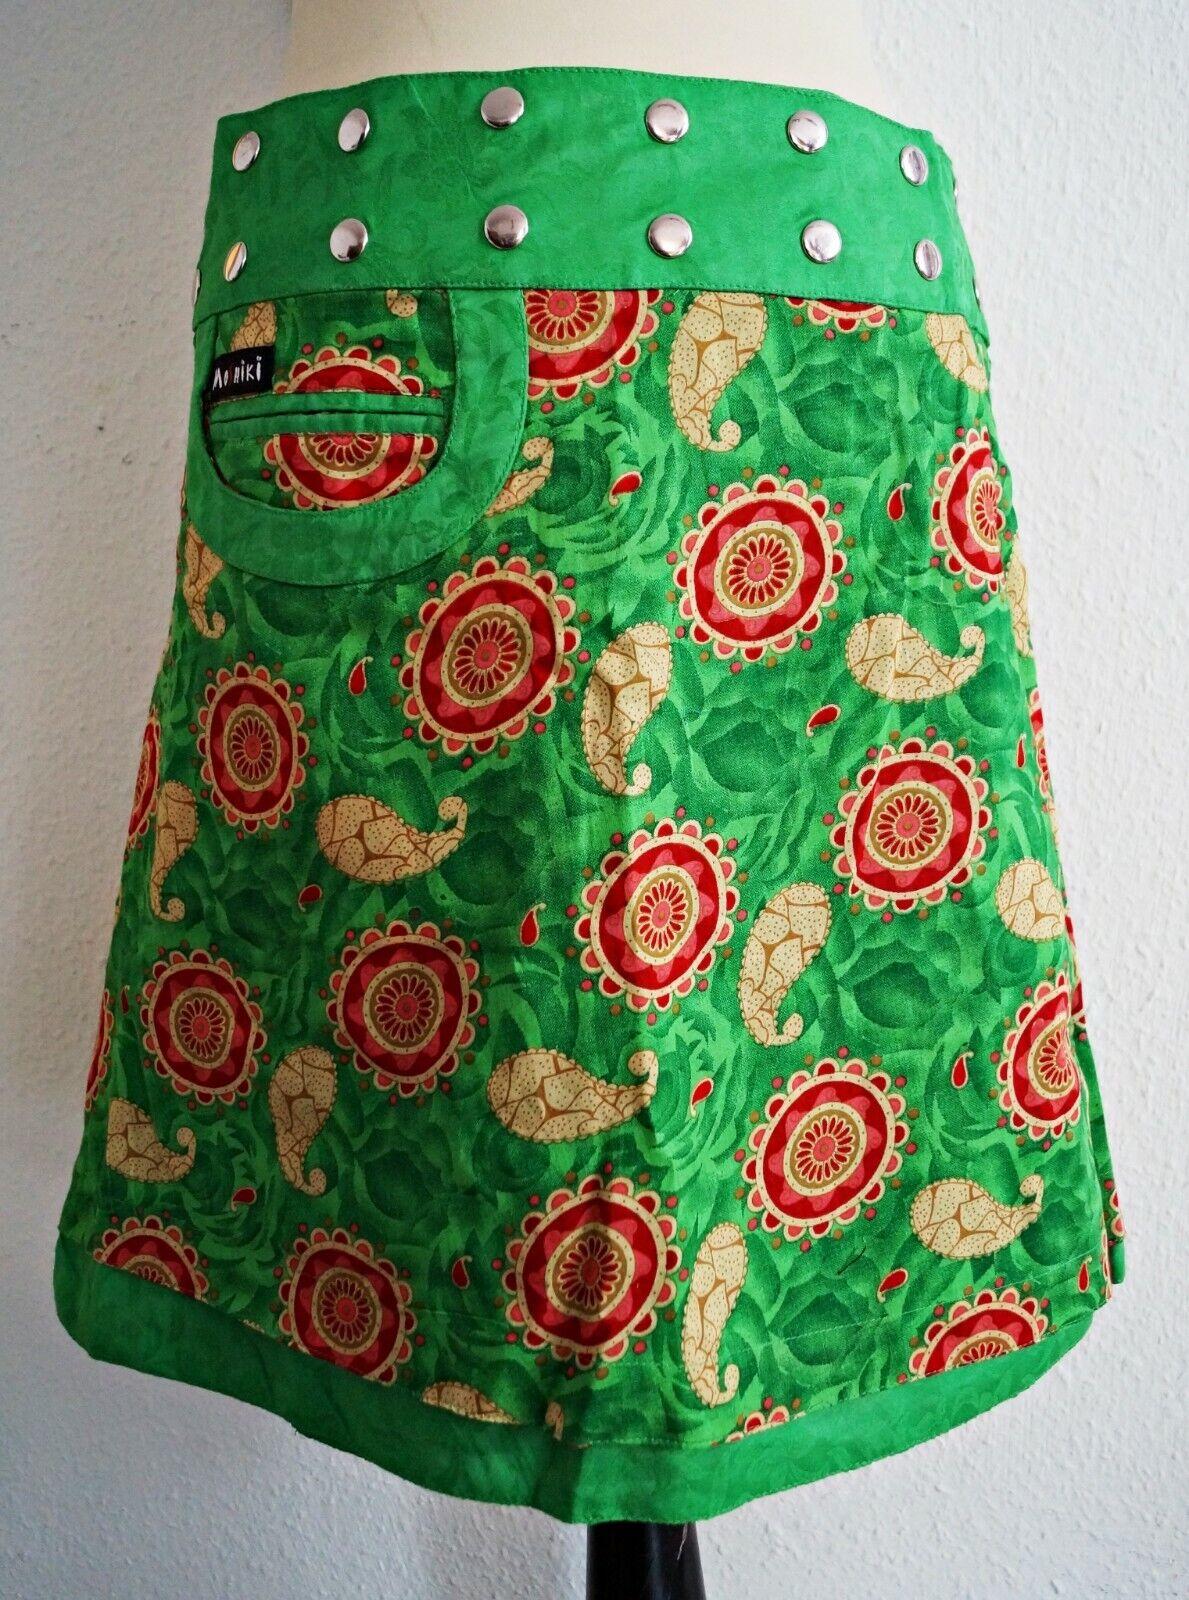 411 MOSHIKI jupe portefeuille wenderock XXL Coton Grün rot Größe 48 - 56